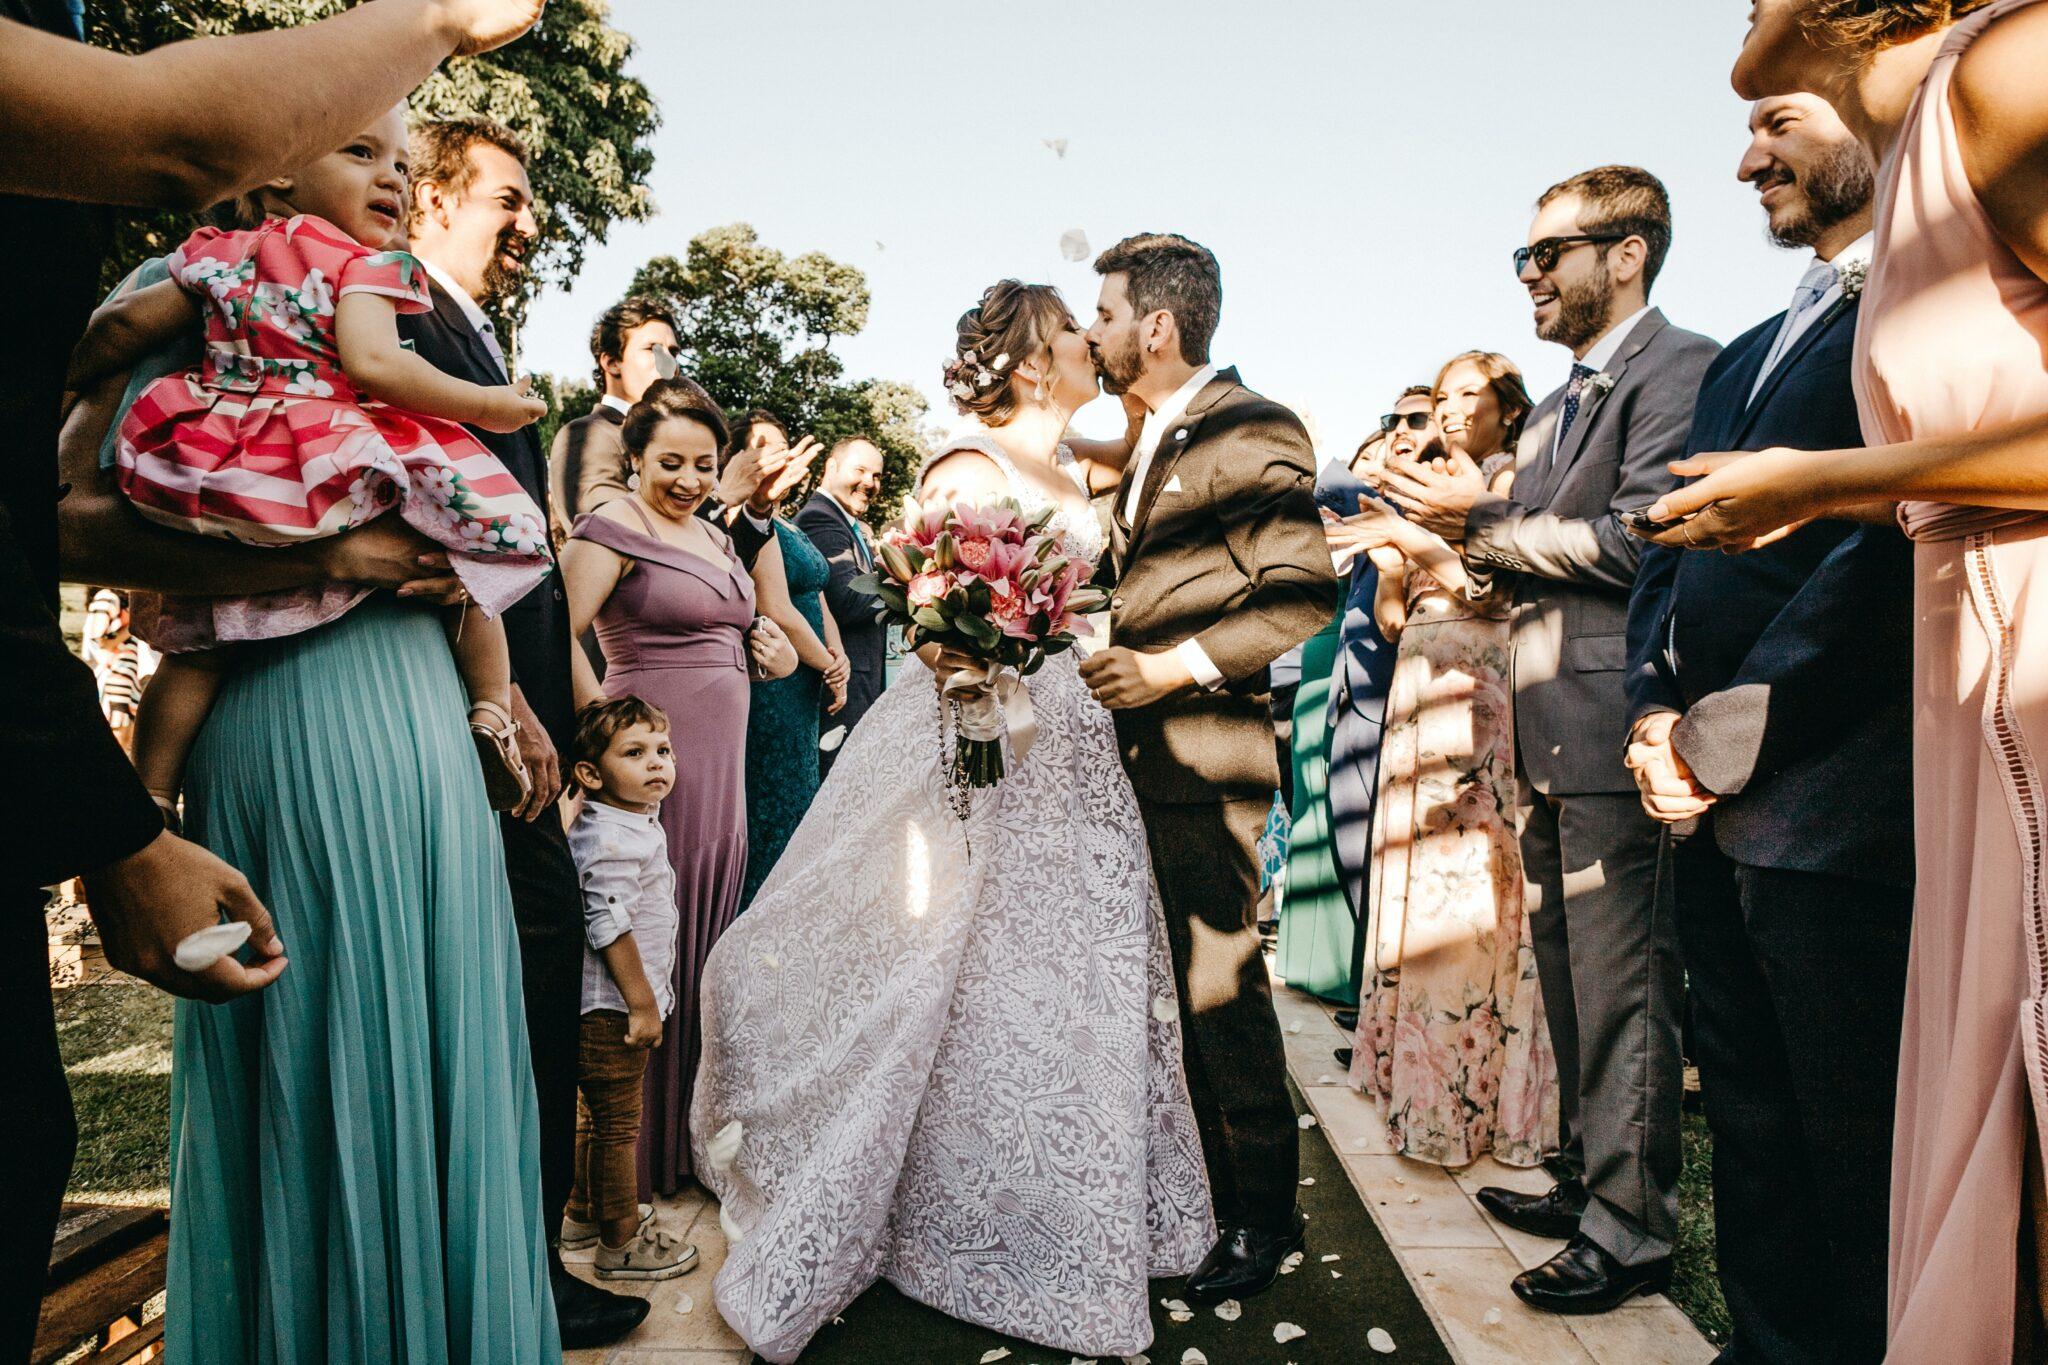 Surprise wedding ideas